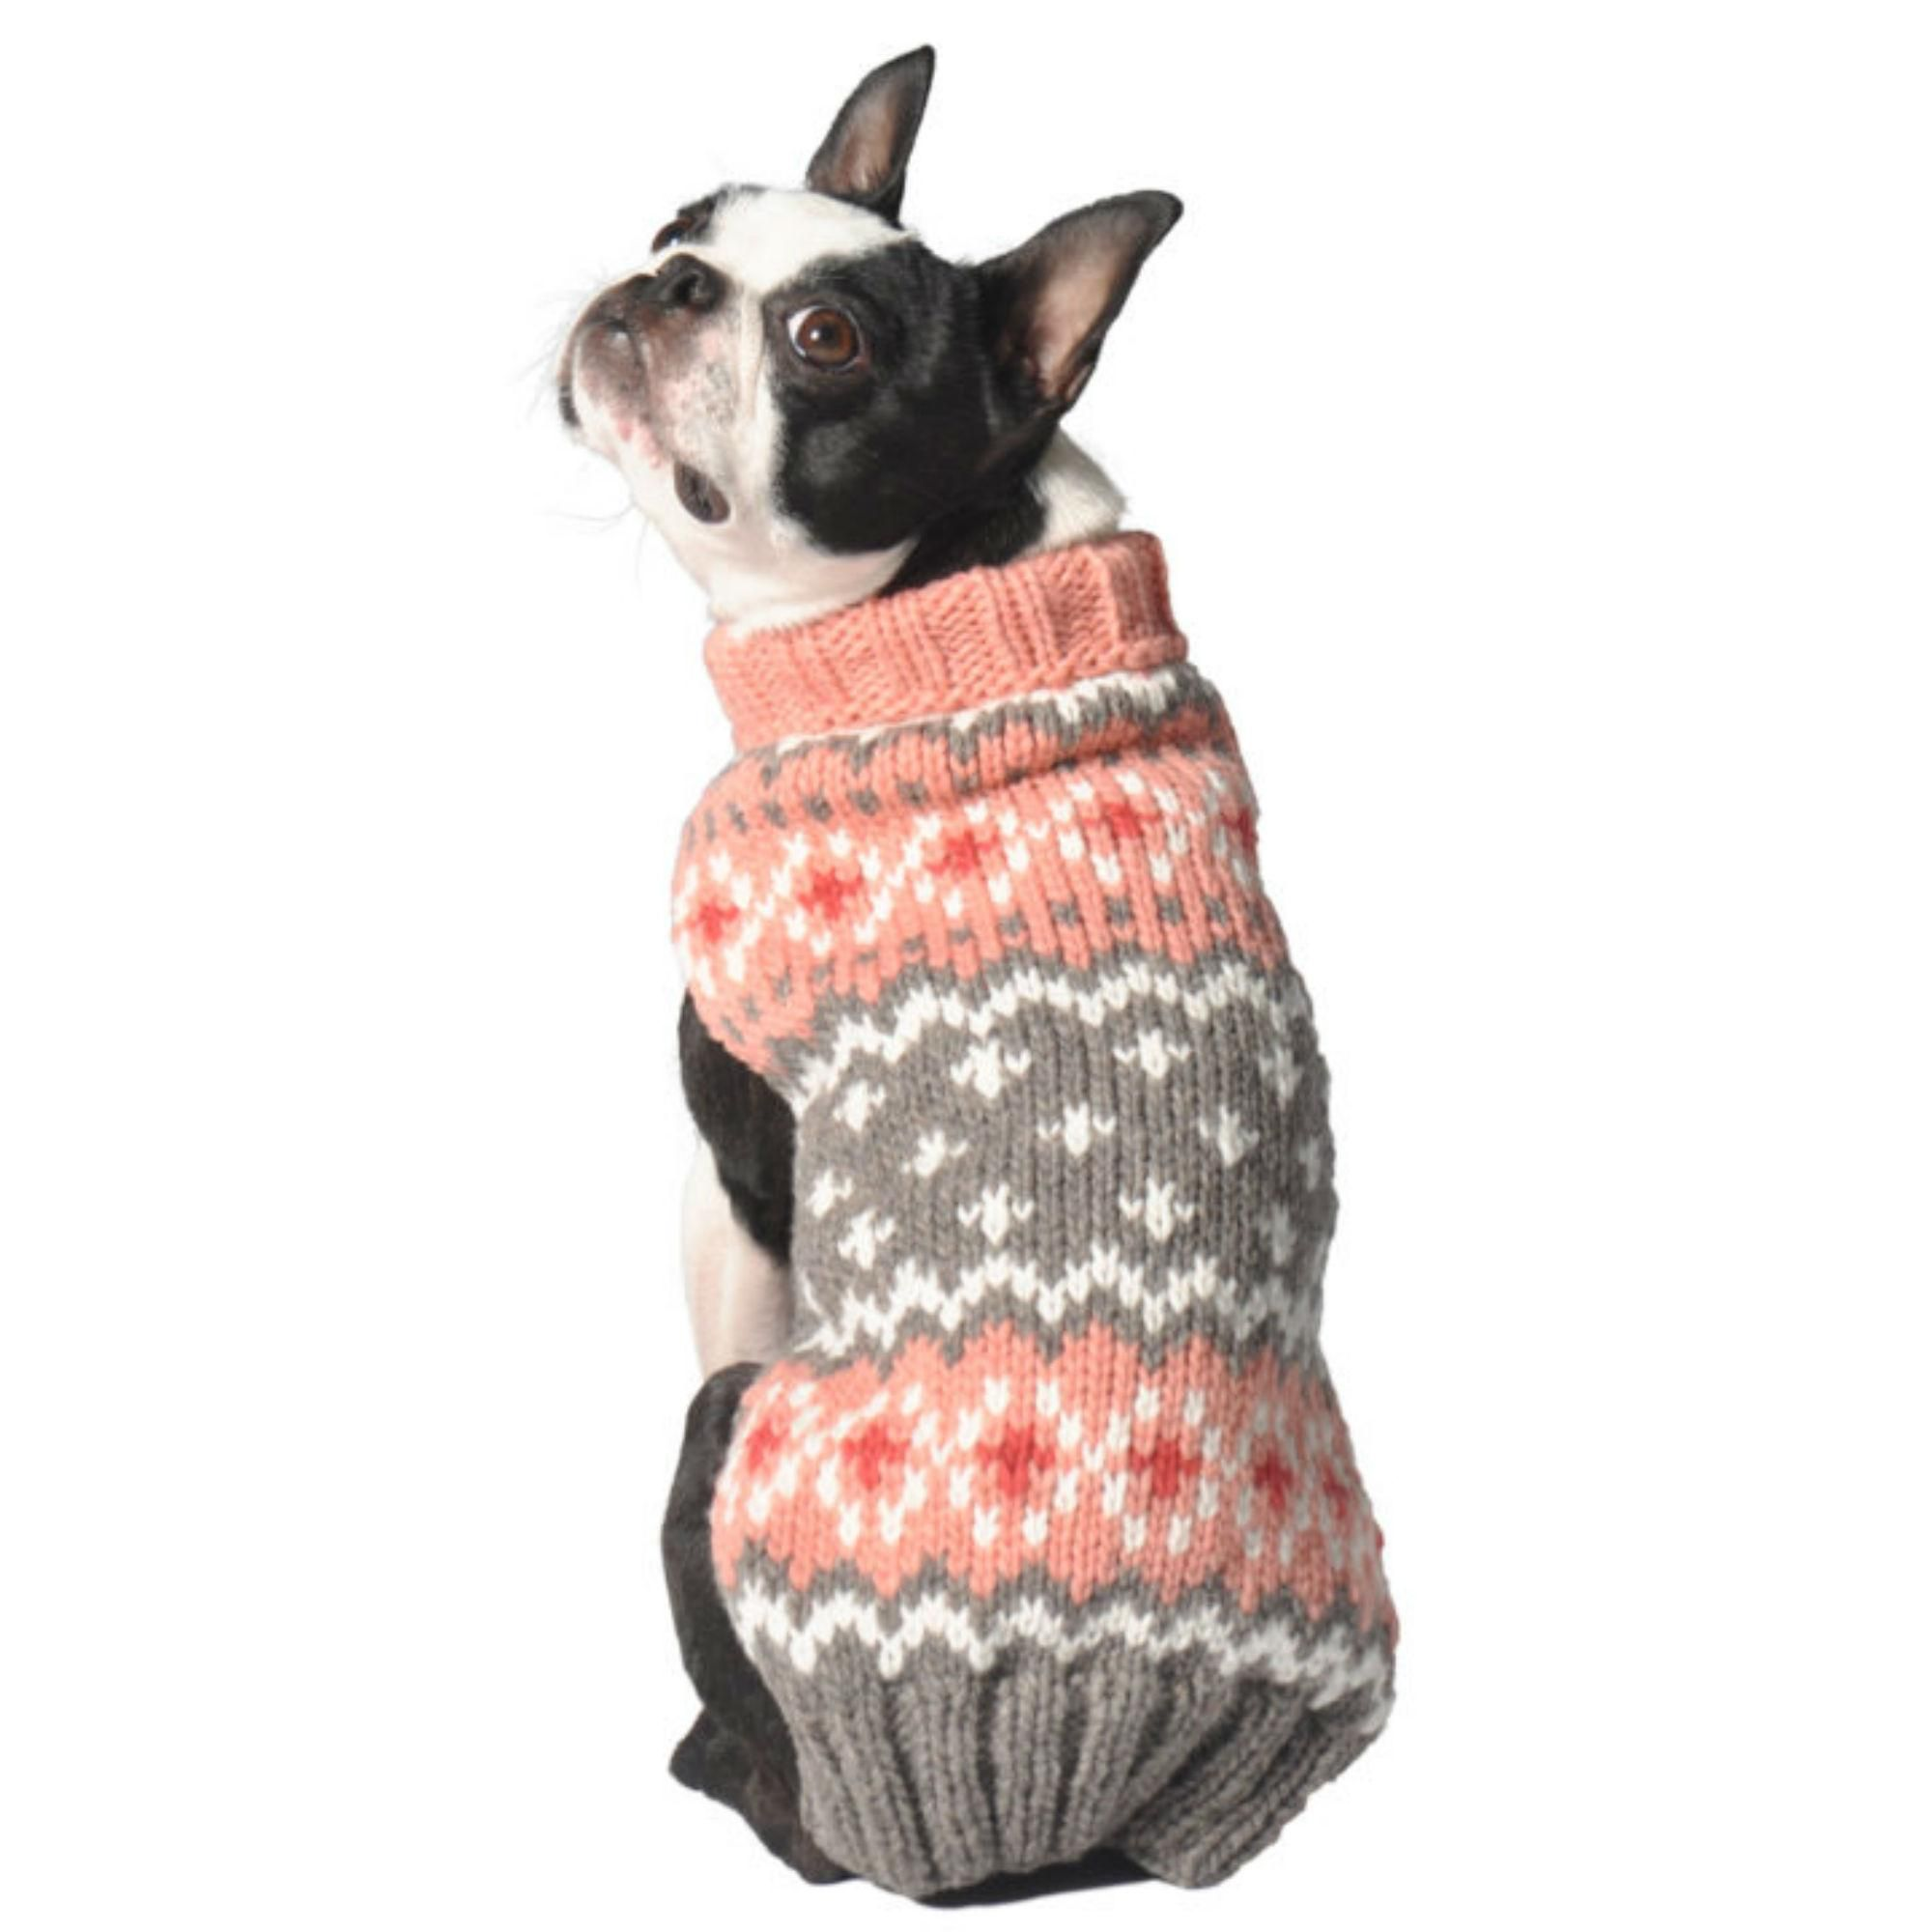 Handmade Fairisle Wool Dog Sweater Peach Chilly Dogs Tough